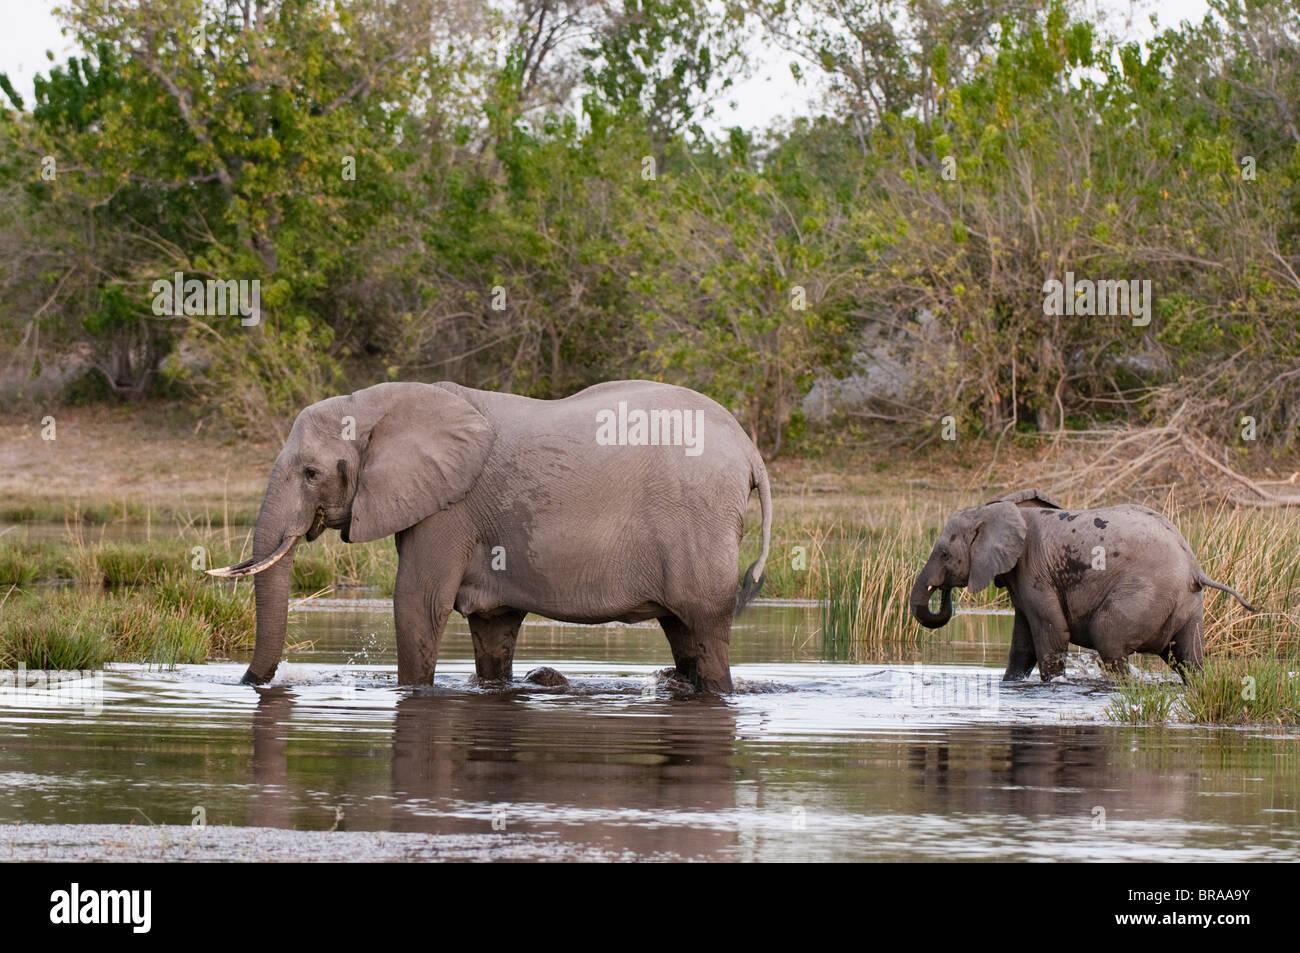 Elephant (Loxodonta africana), Savute Channel, Linyanti, Botswana, Africa - Stock Image